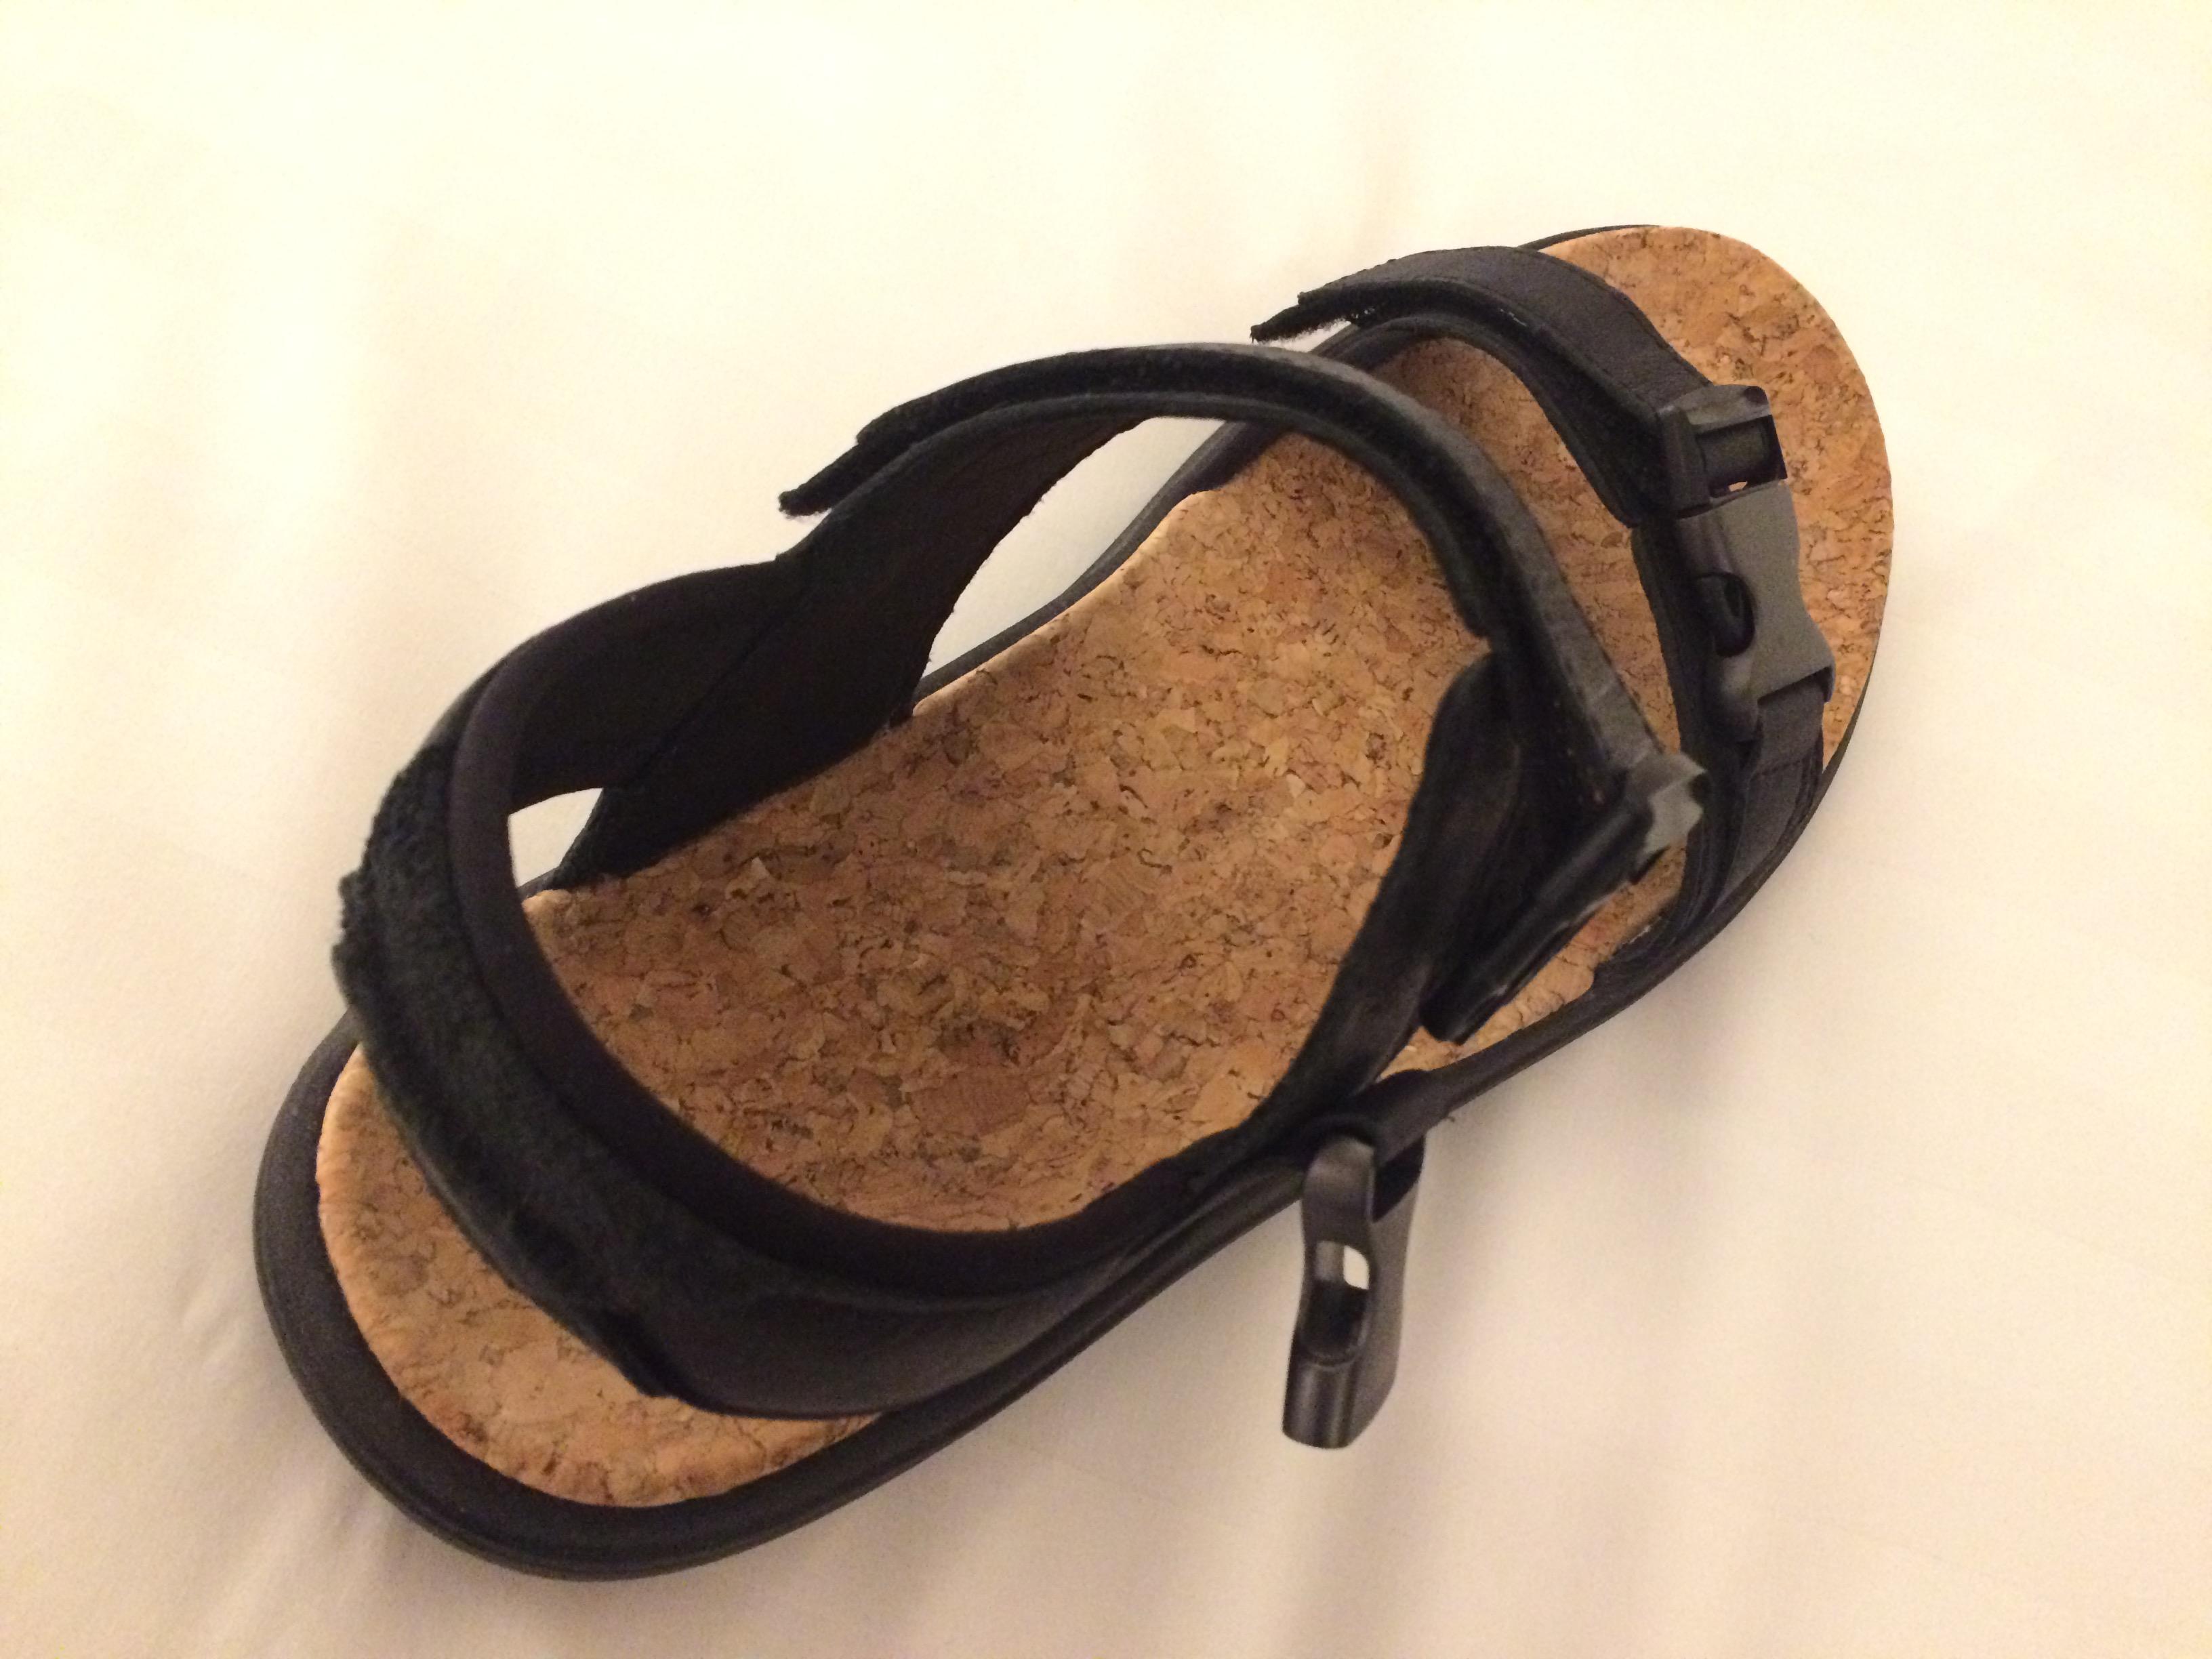 0ed8c4490 REVIEWED  Teva Terra-Float Universal Lux sandals - Travgear.com